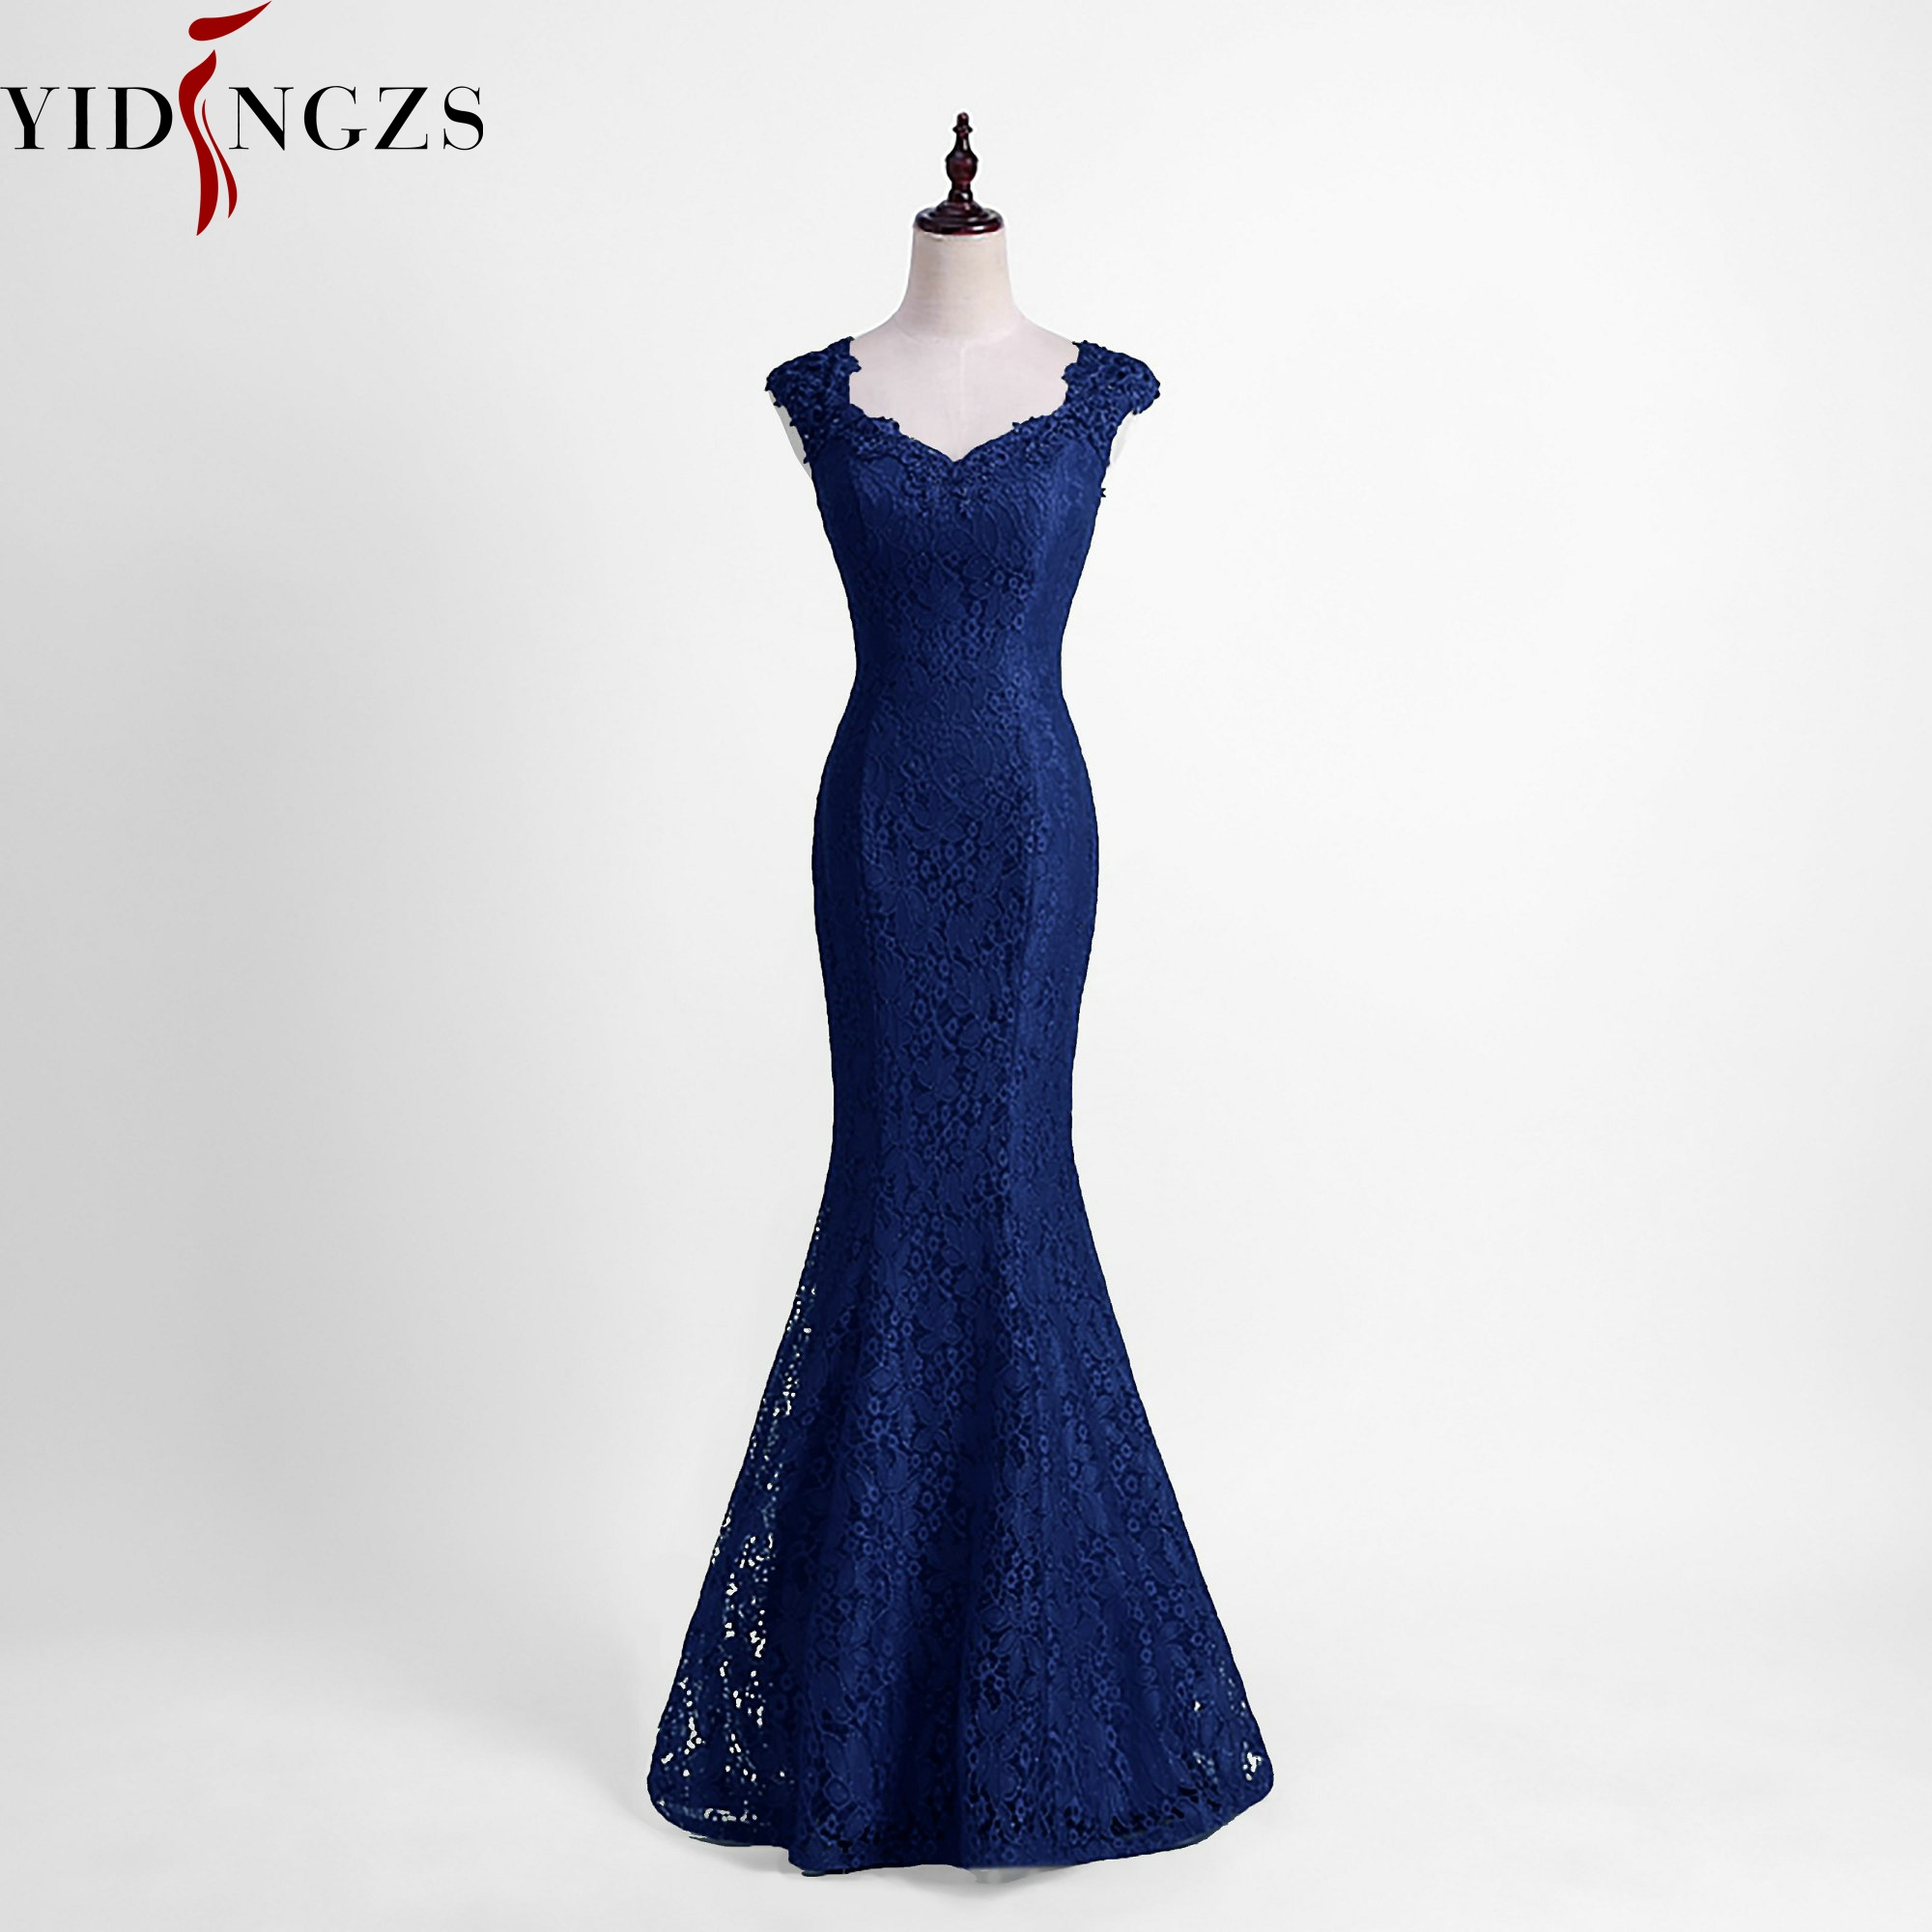 YIDINGZS Elegant Beads Lace Mermaid Bridesmaid Dress 2019 Slim Burgundy Wedding Party Dress